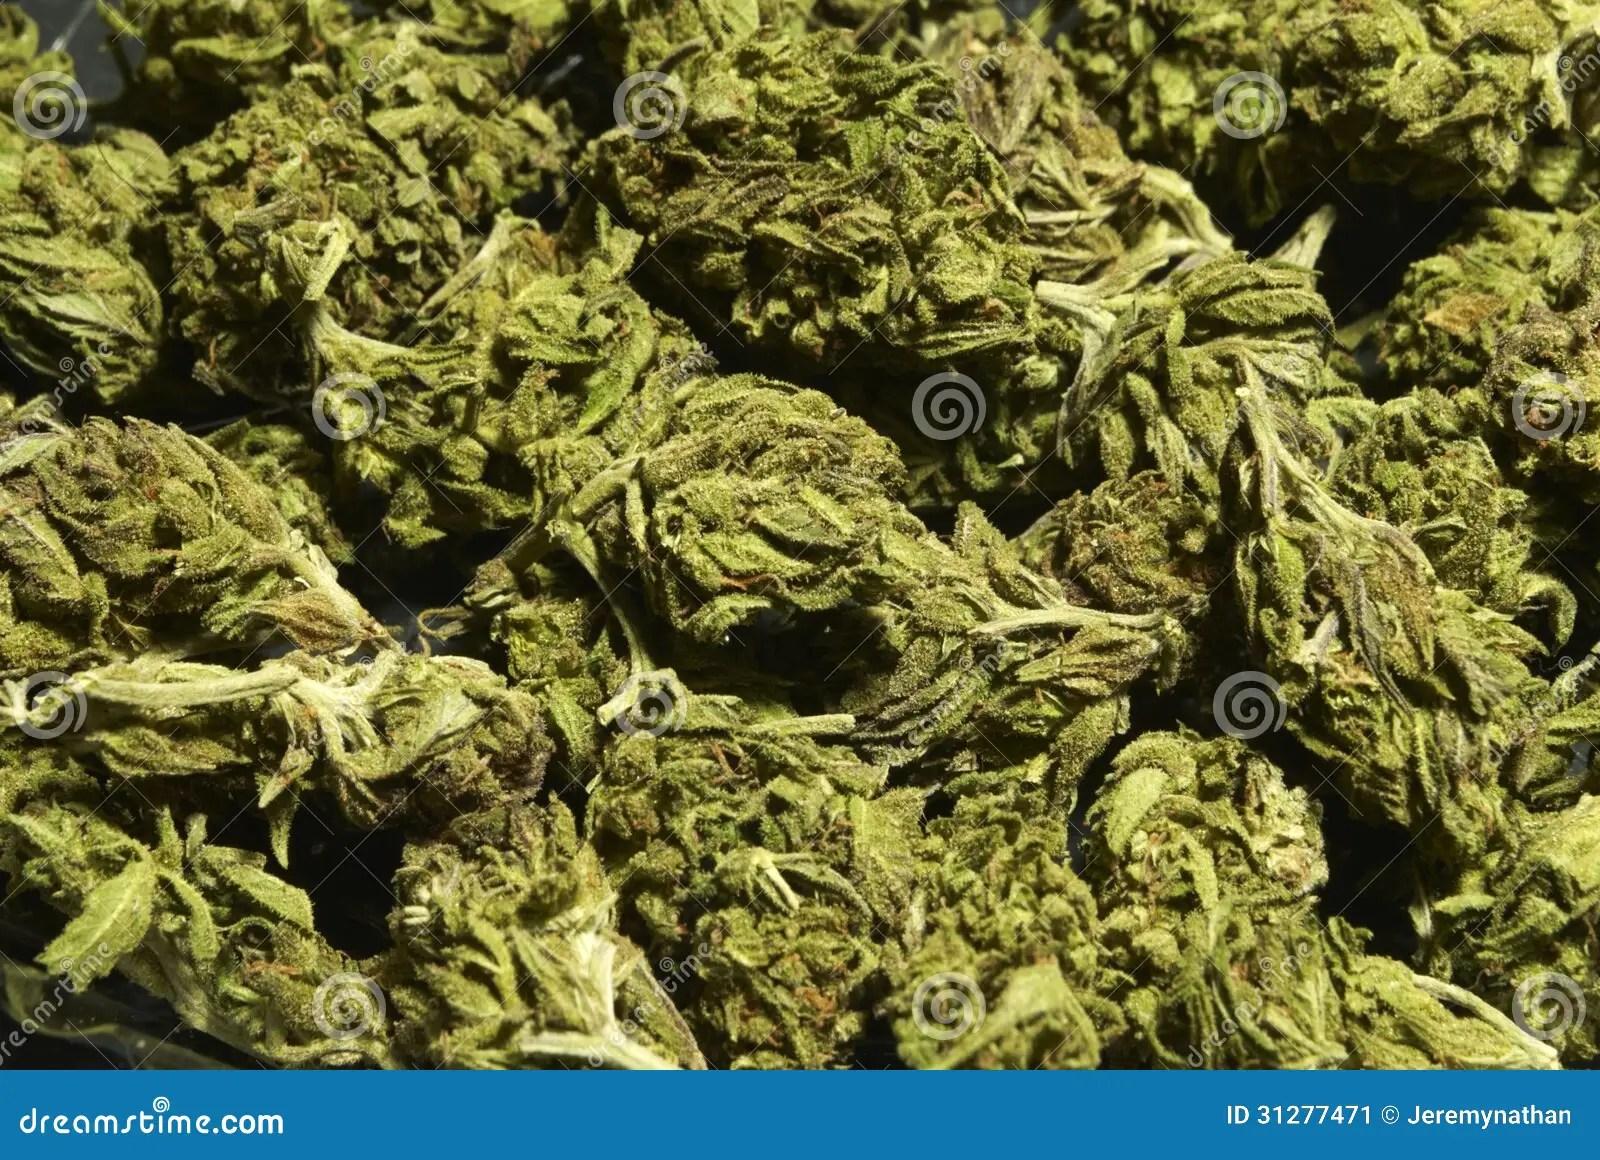 Marijuana Hd Wallpapers Free Download Medical Marijuana Background Stock Image Image 31277471